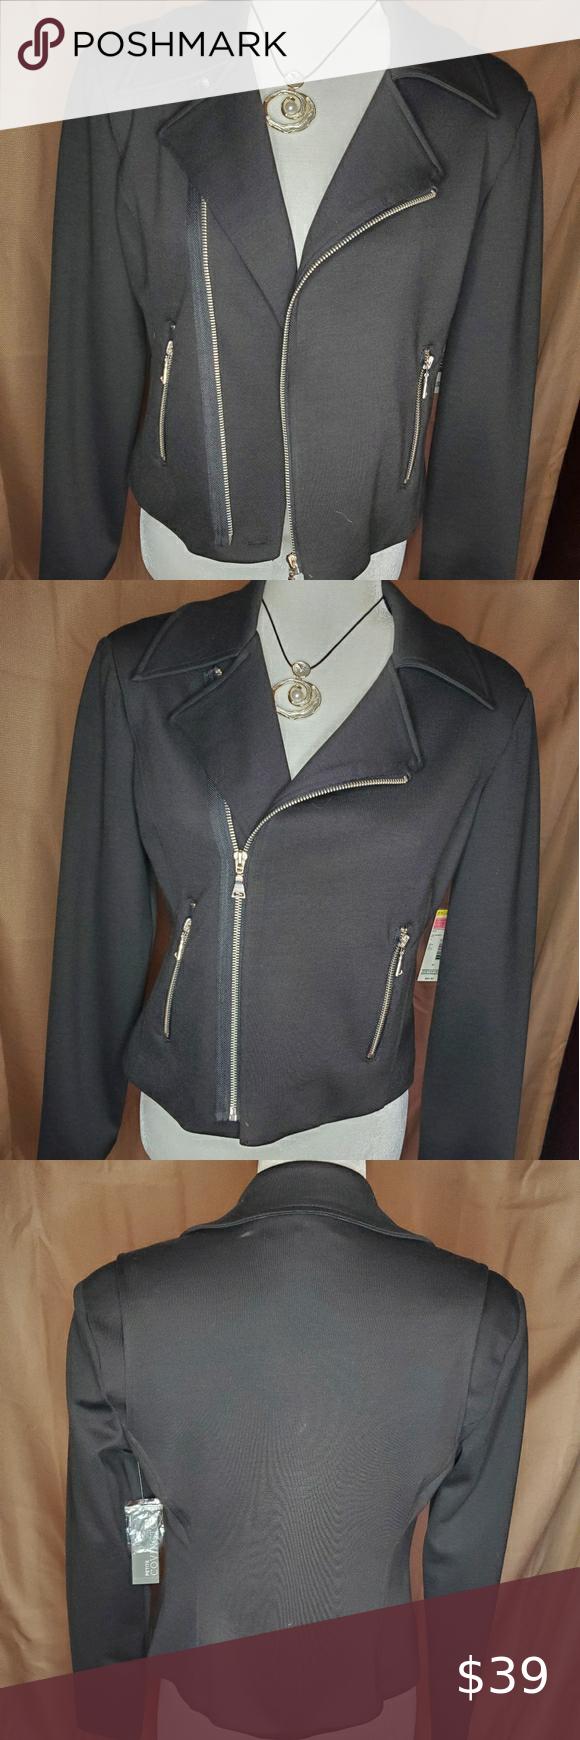 Covington Jacket Jackets Black Zip Ups Clothes Design [ 1740 x 580 Pixel ]